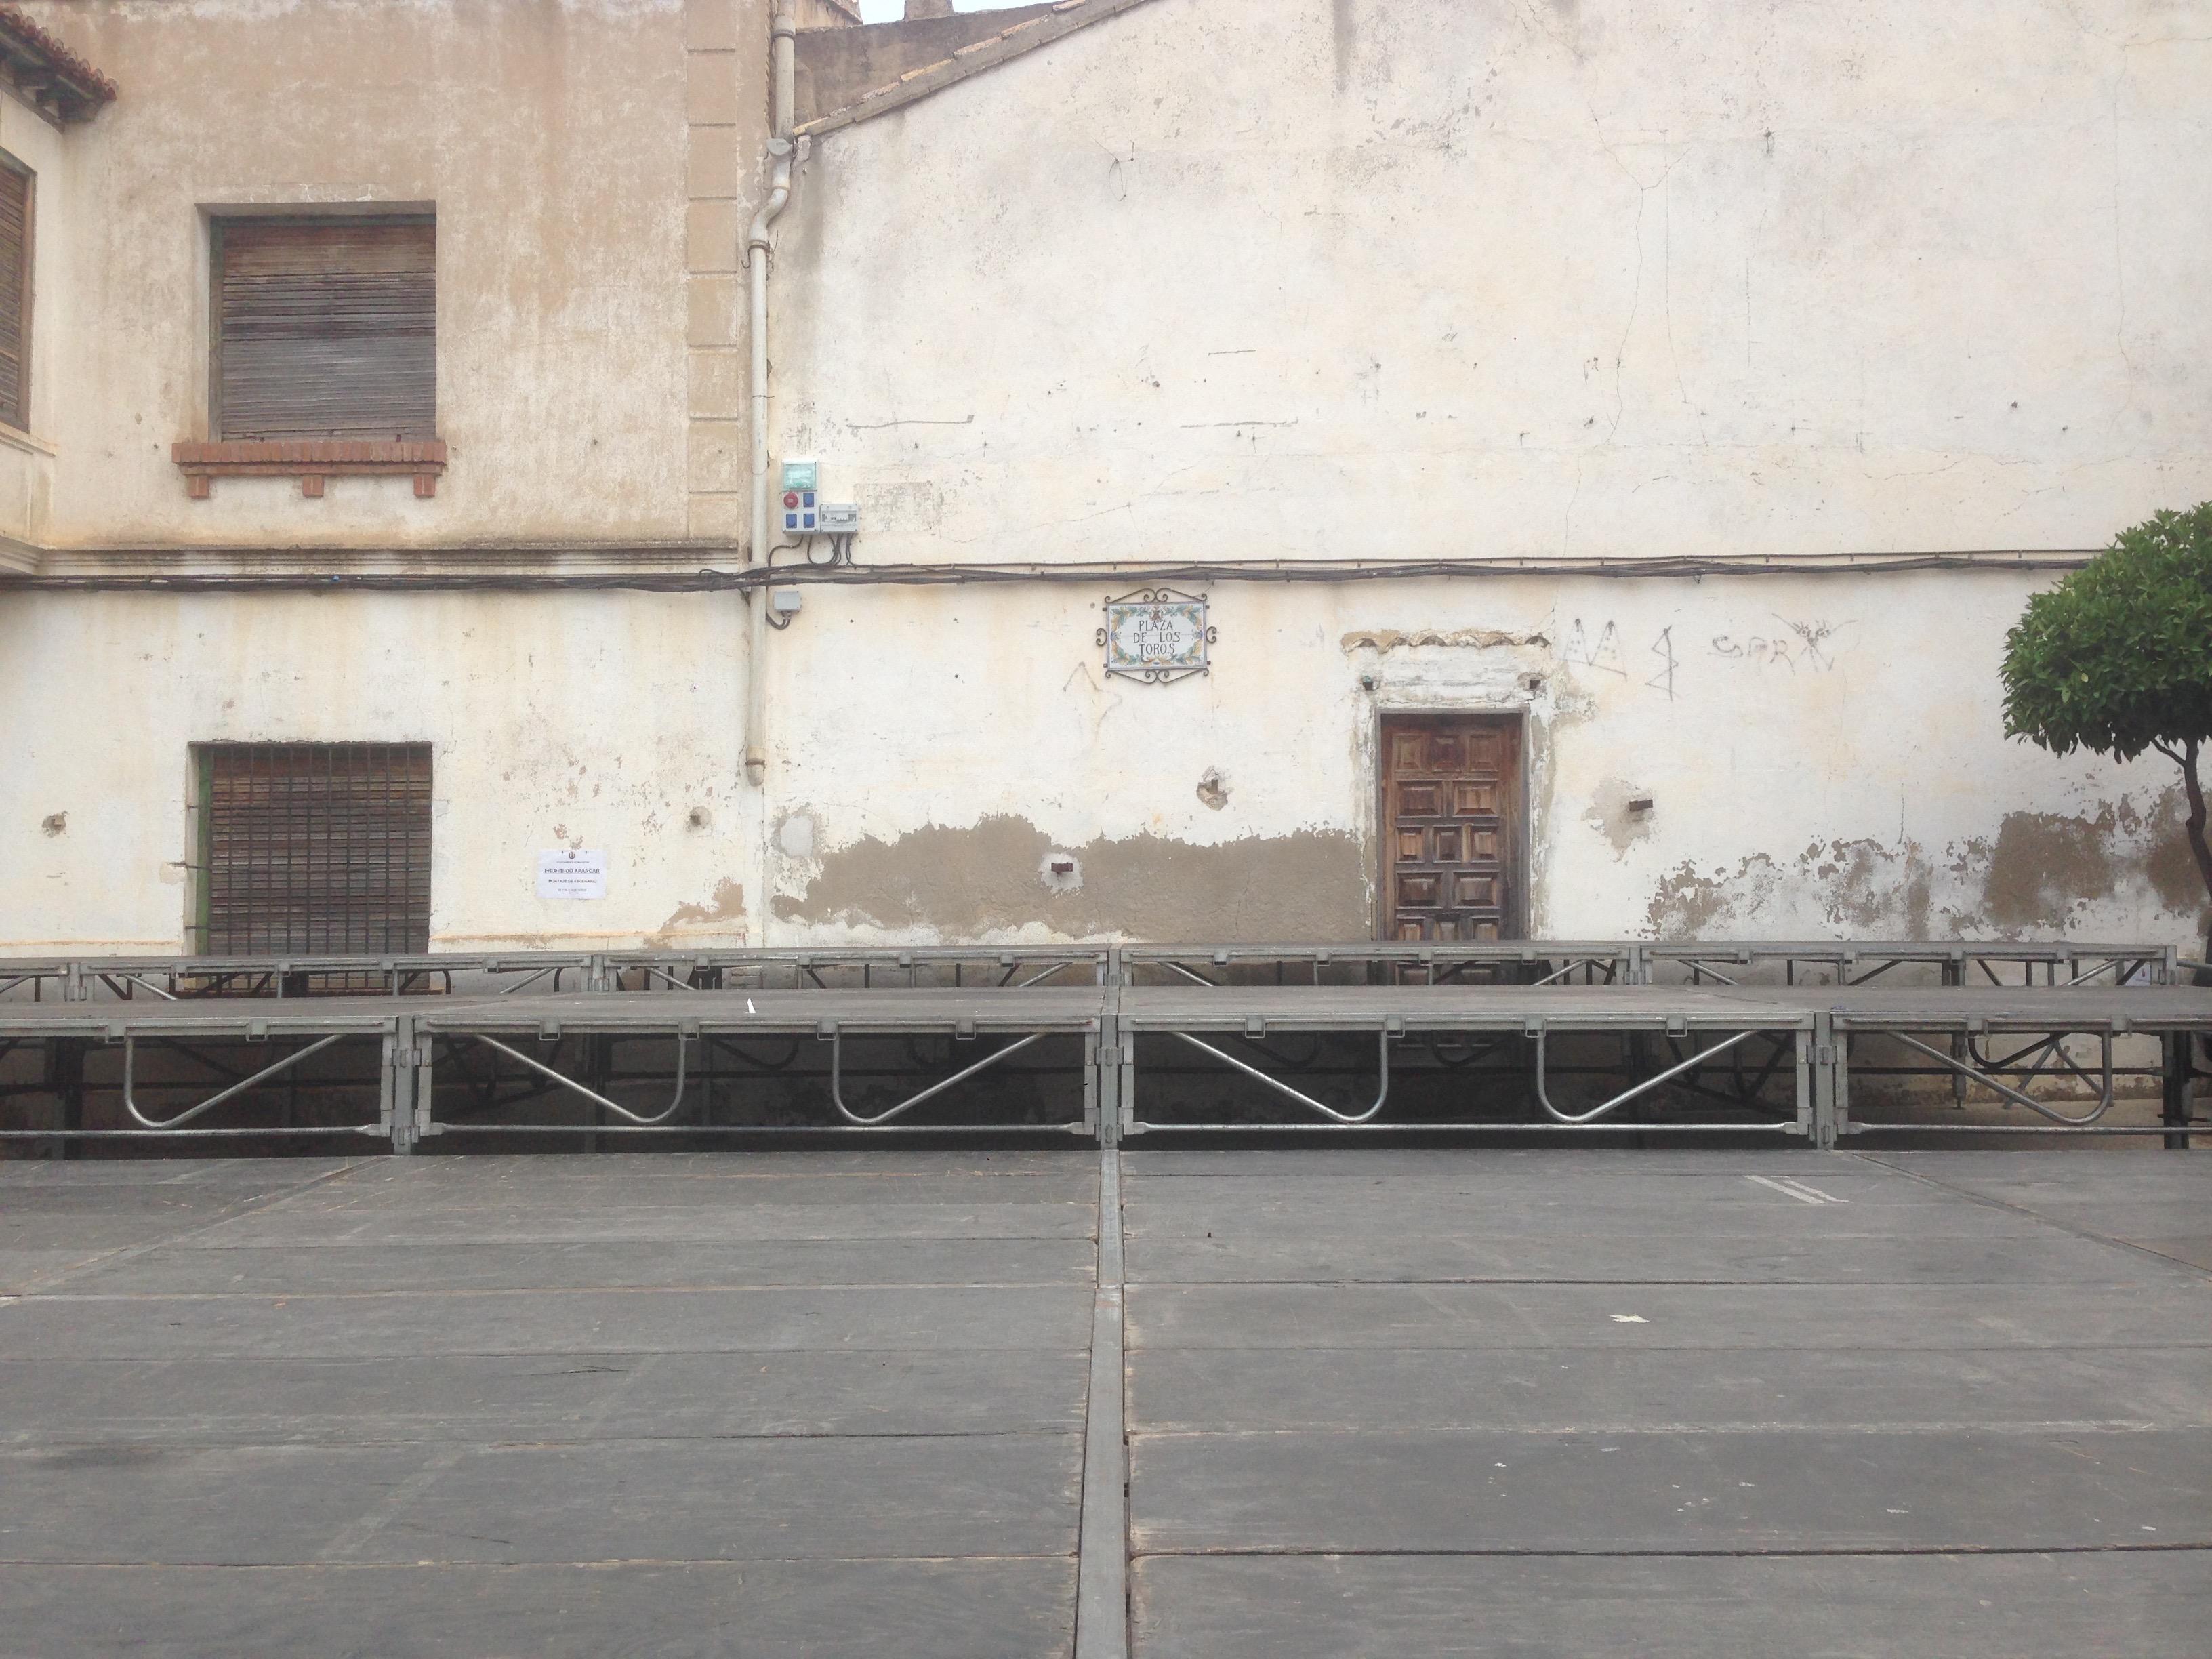 Escenario a 3 alturas para bandas Macastre 2015